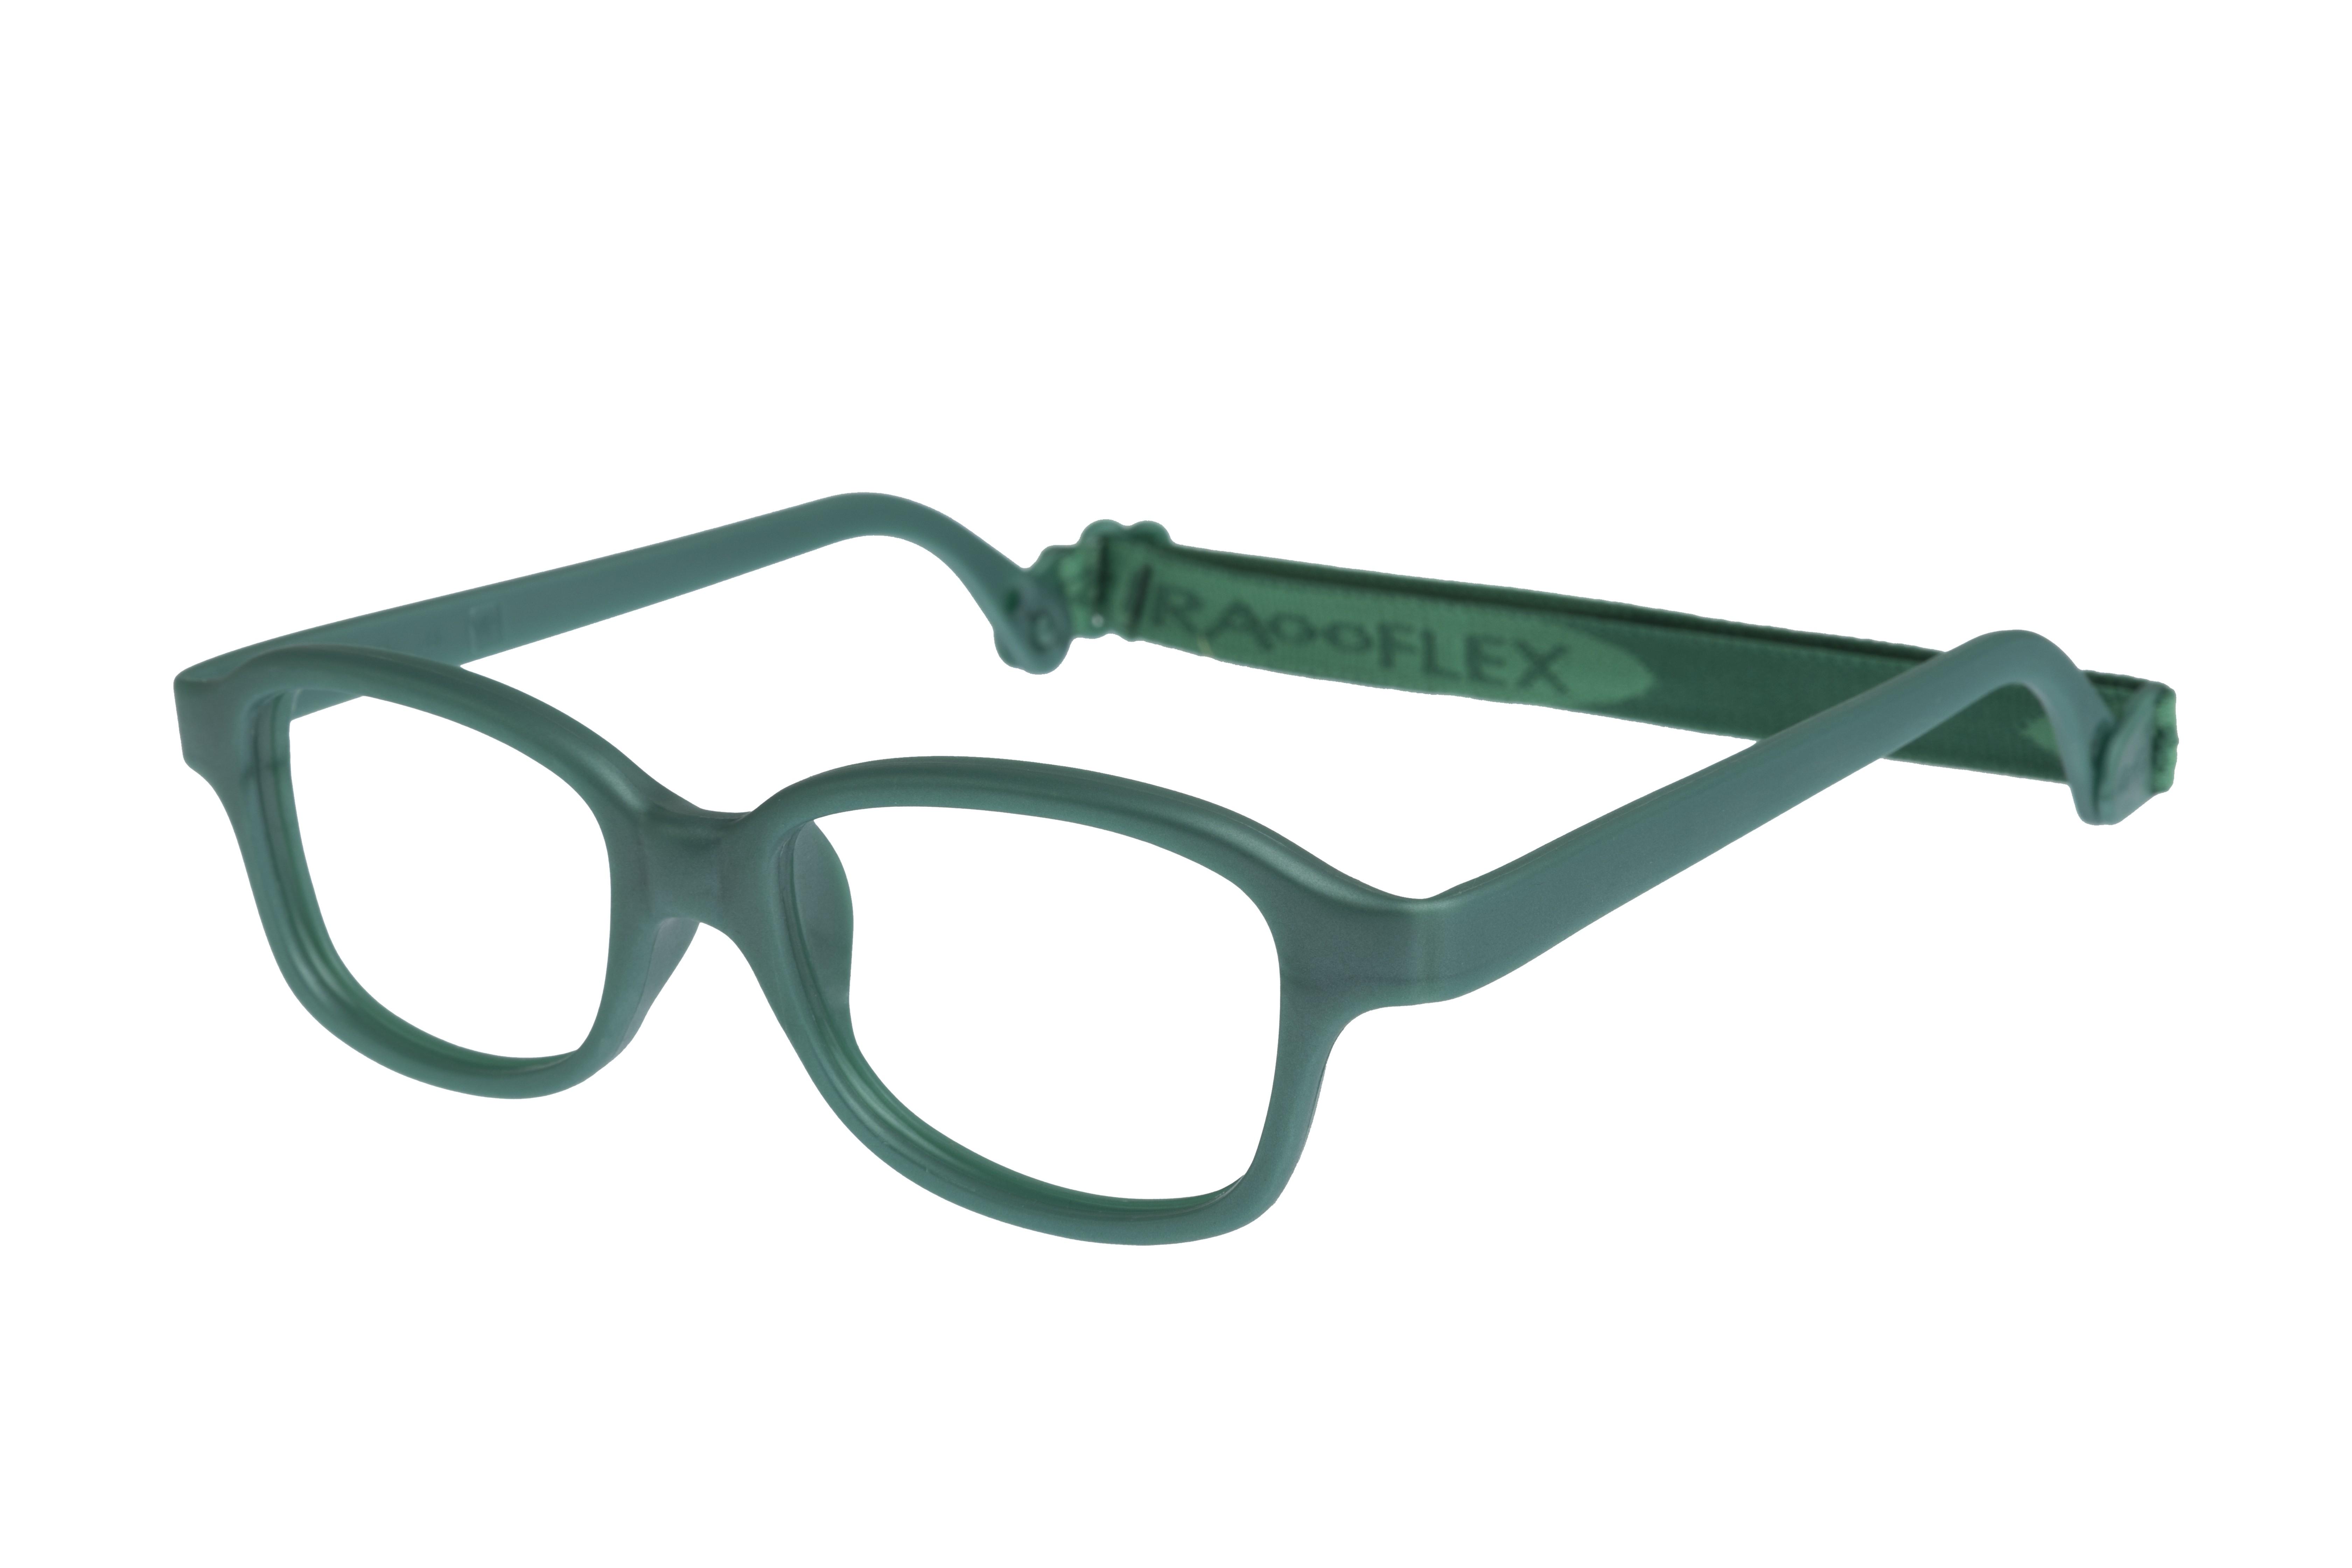 07bca39d27b Miraflex Mike 1-VP 42 17 Children s Eyeglasses Green Pearl Mike 1-VP -  Optiwow